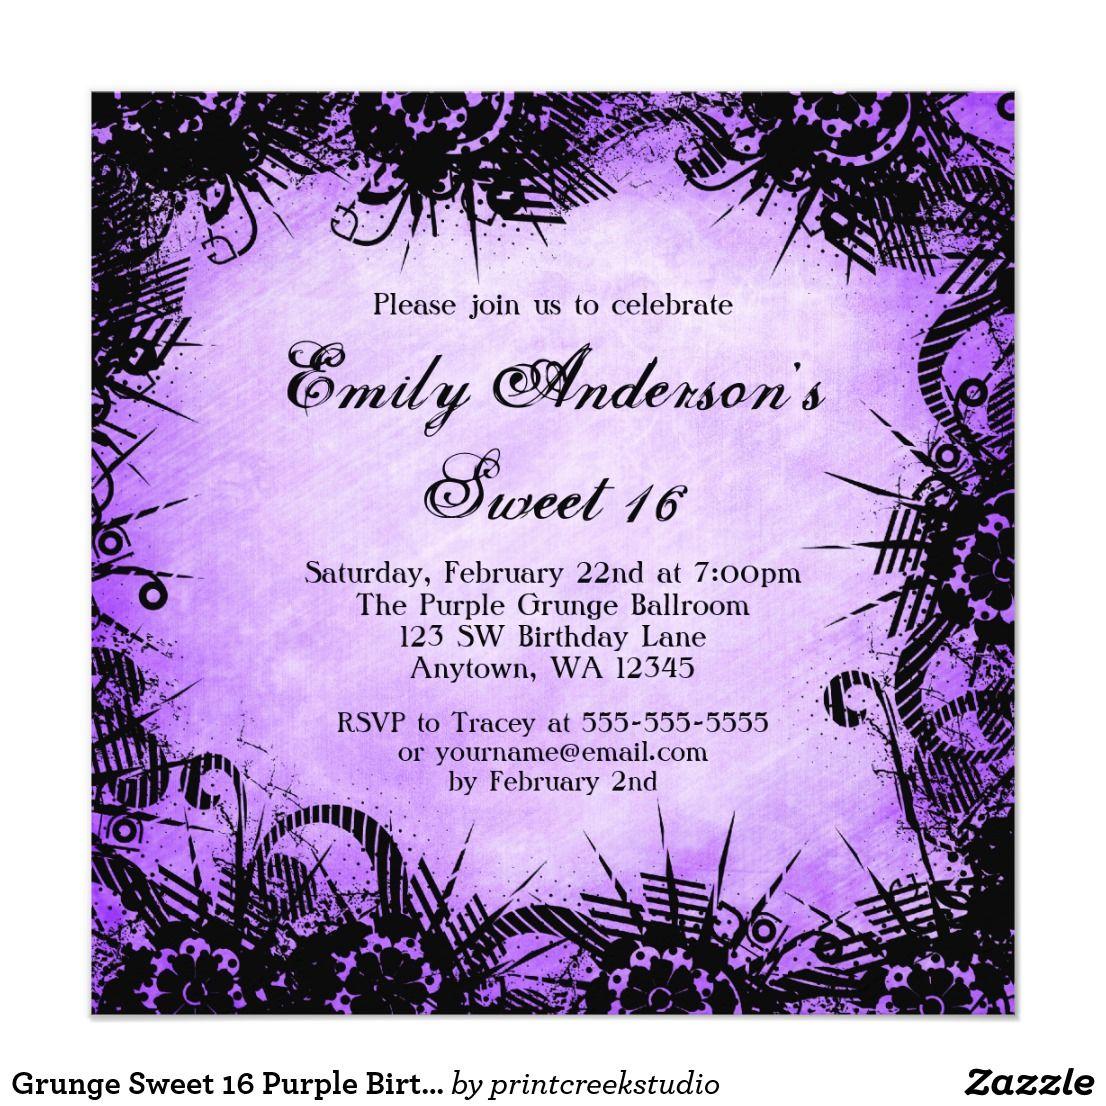 Grunge Sweet 16 Purple Birthday Party Invitations A cool black ...